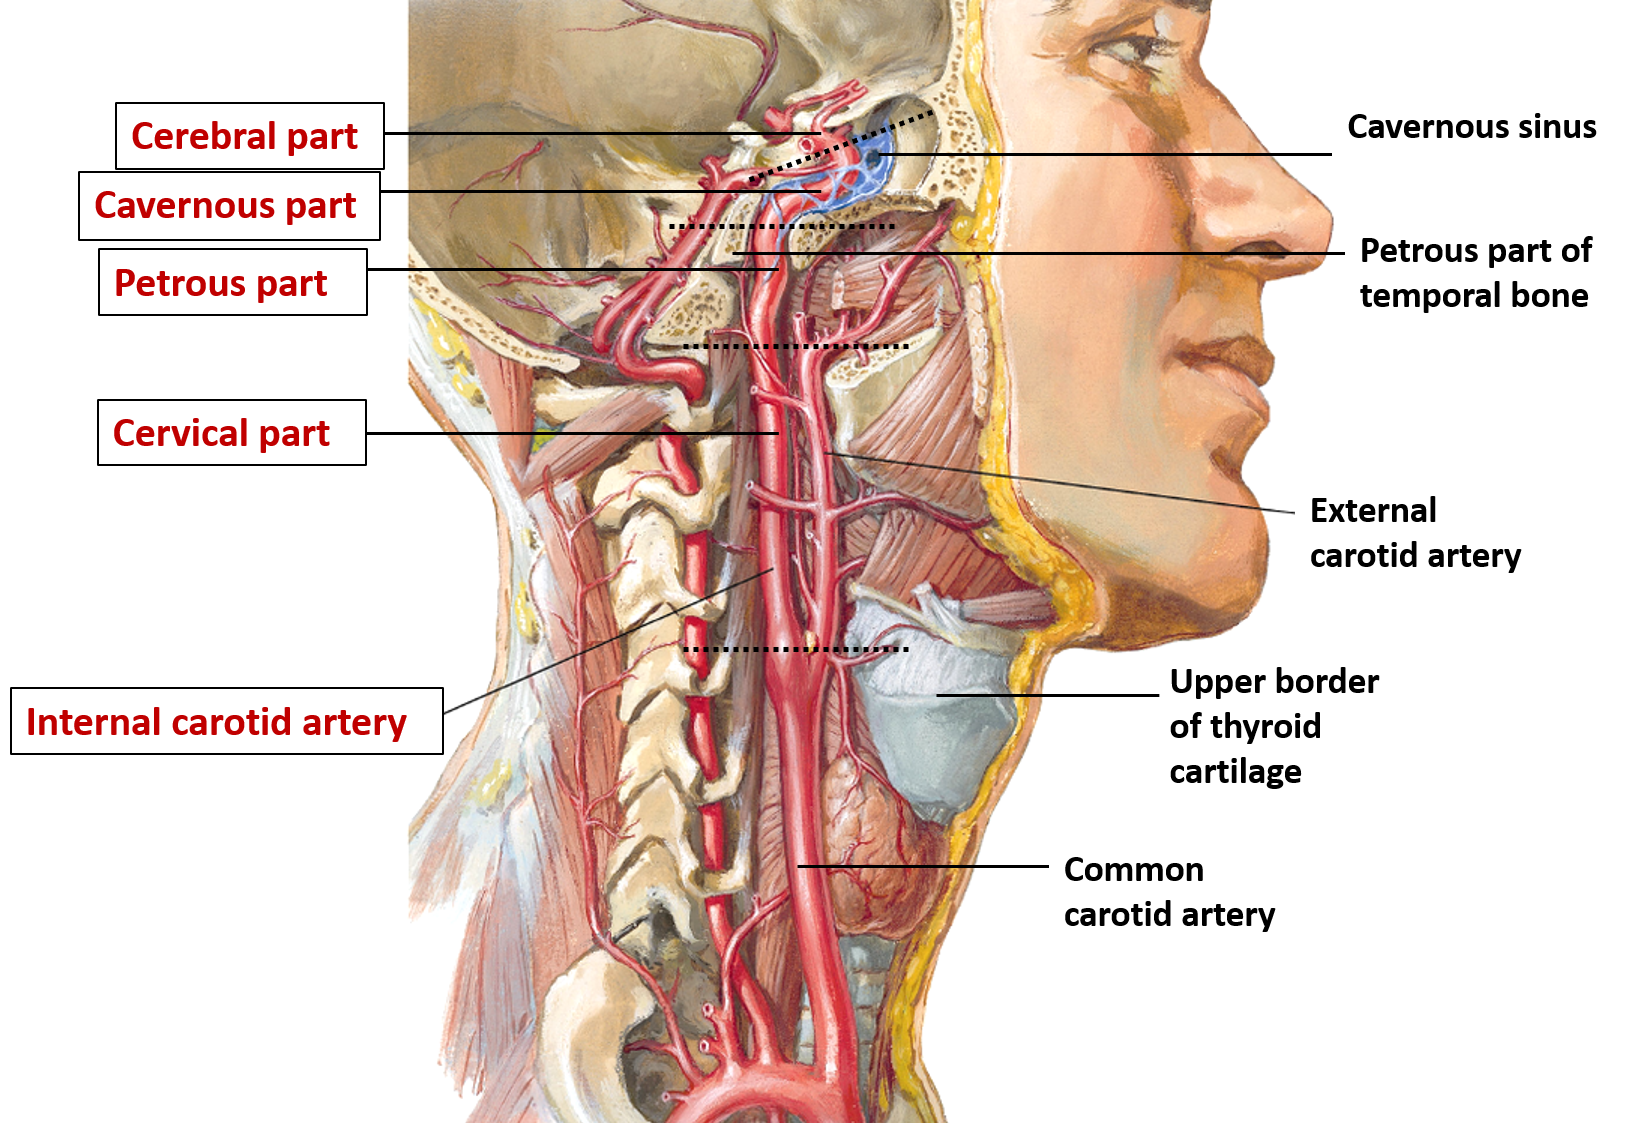 Internal Carotid Artery -